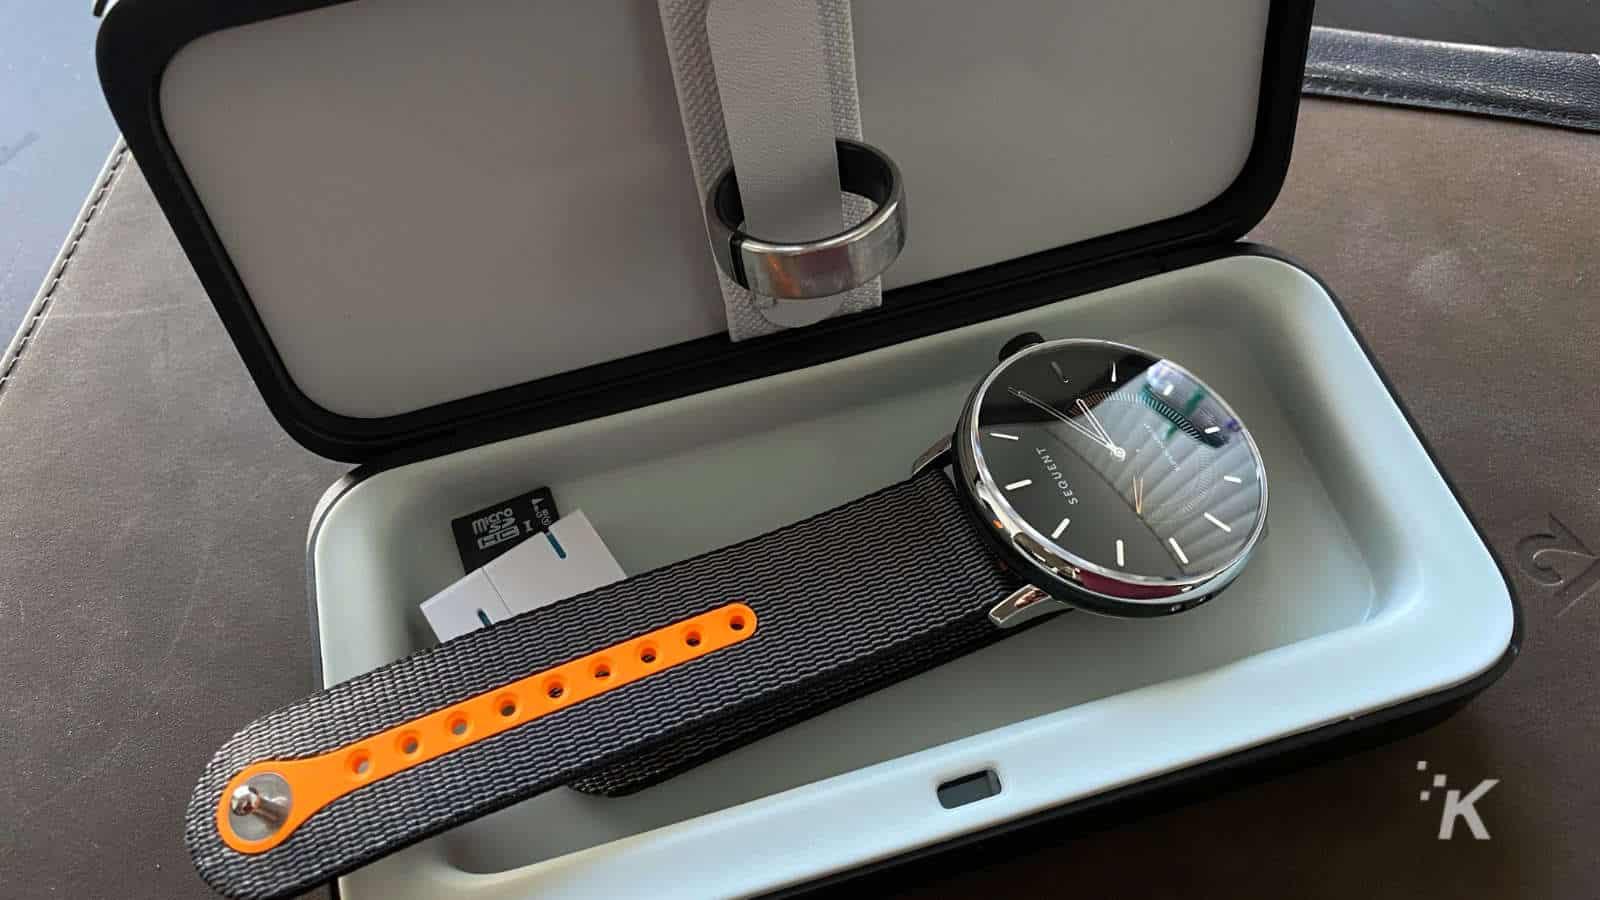 trova go smart lockbox with ring, watch and storage devices inside